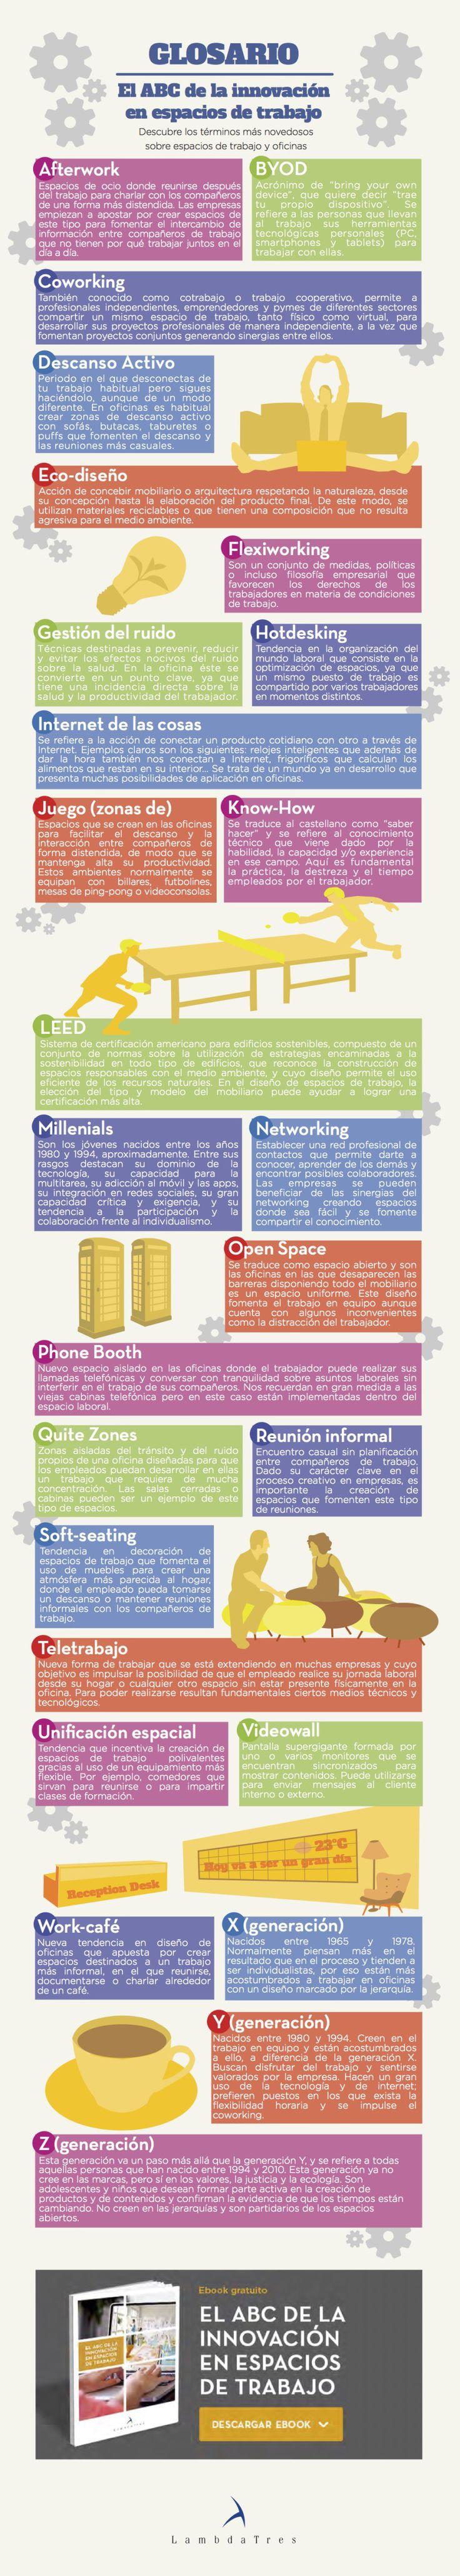 ABC en innovación en espacios de trabajo #infografia